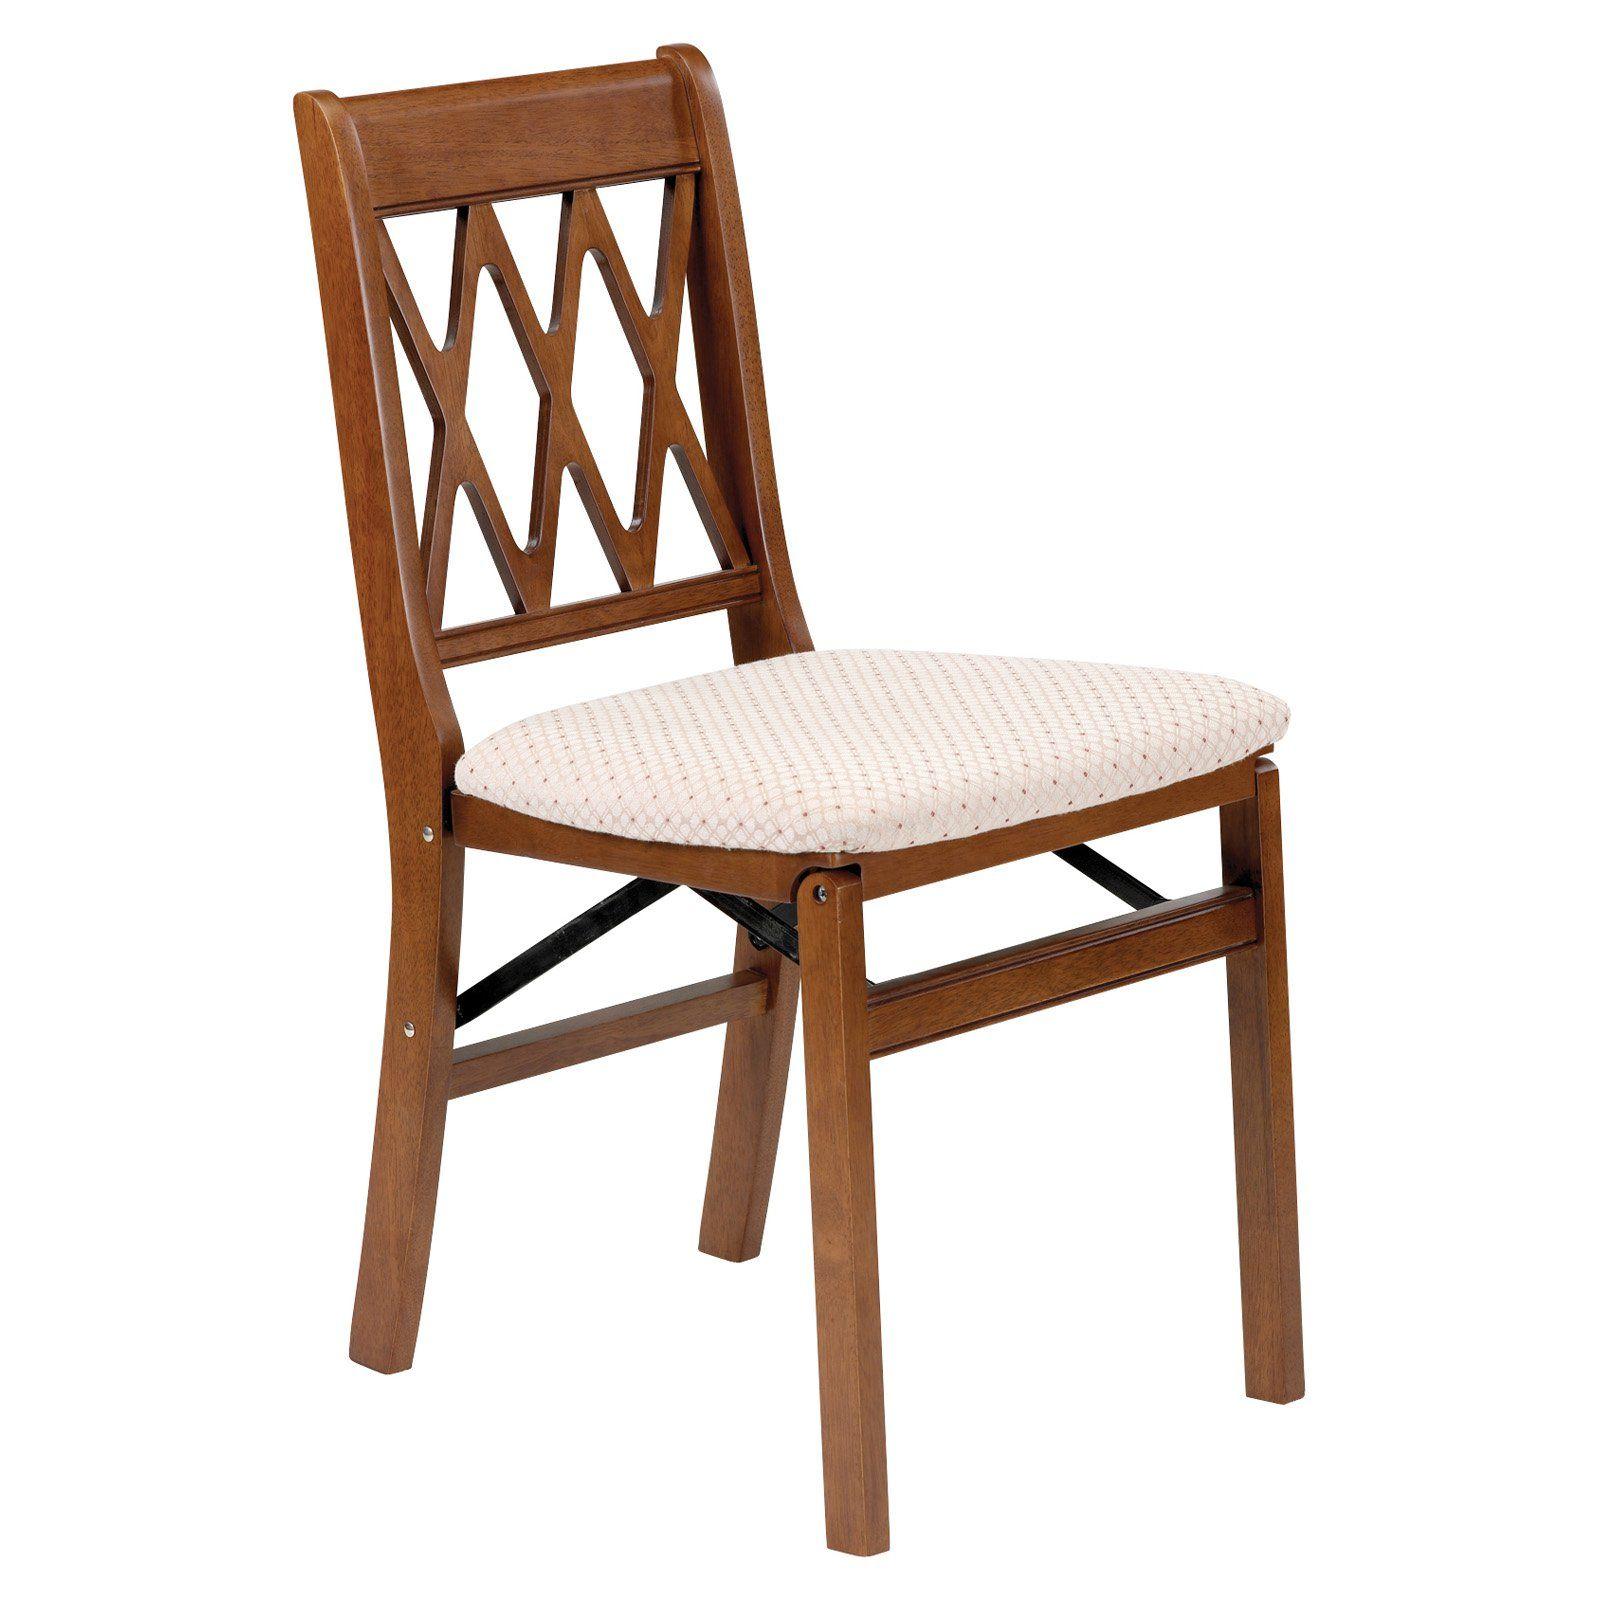 Stakmore Lattice Back Upholstered Folding Chair Set Of 2 Wood